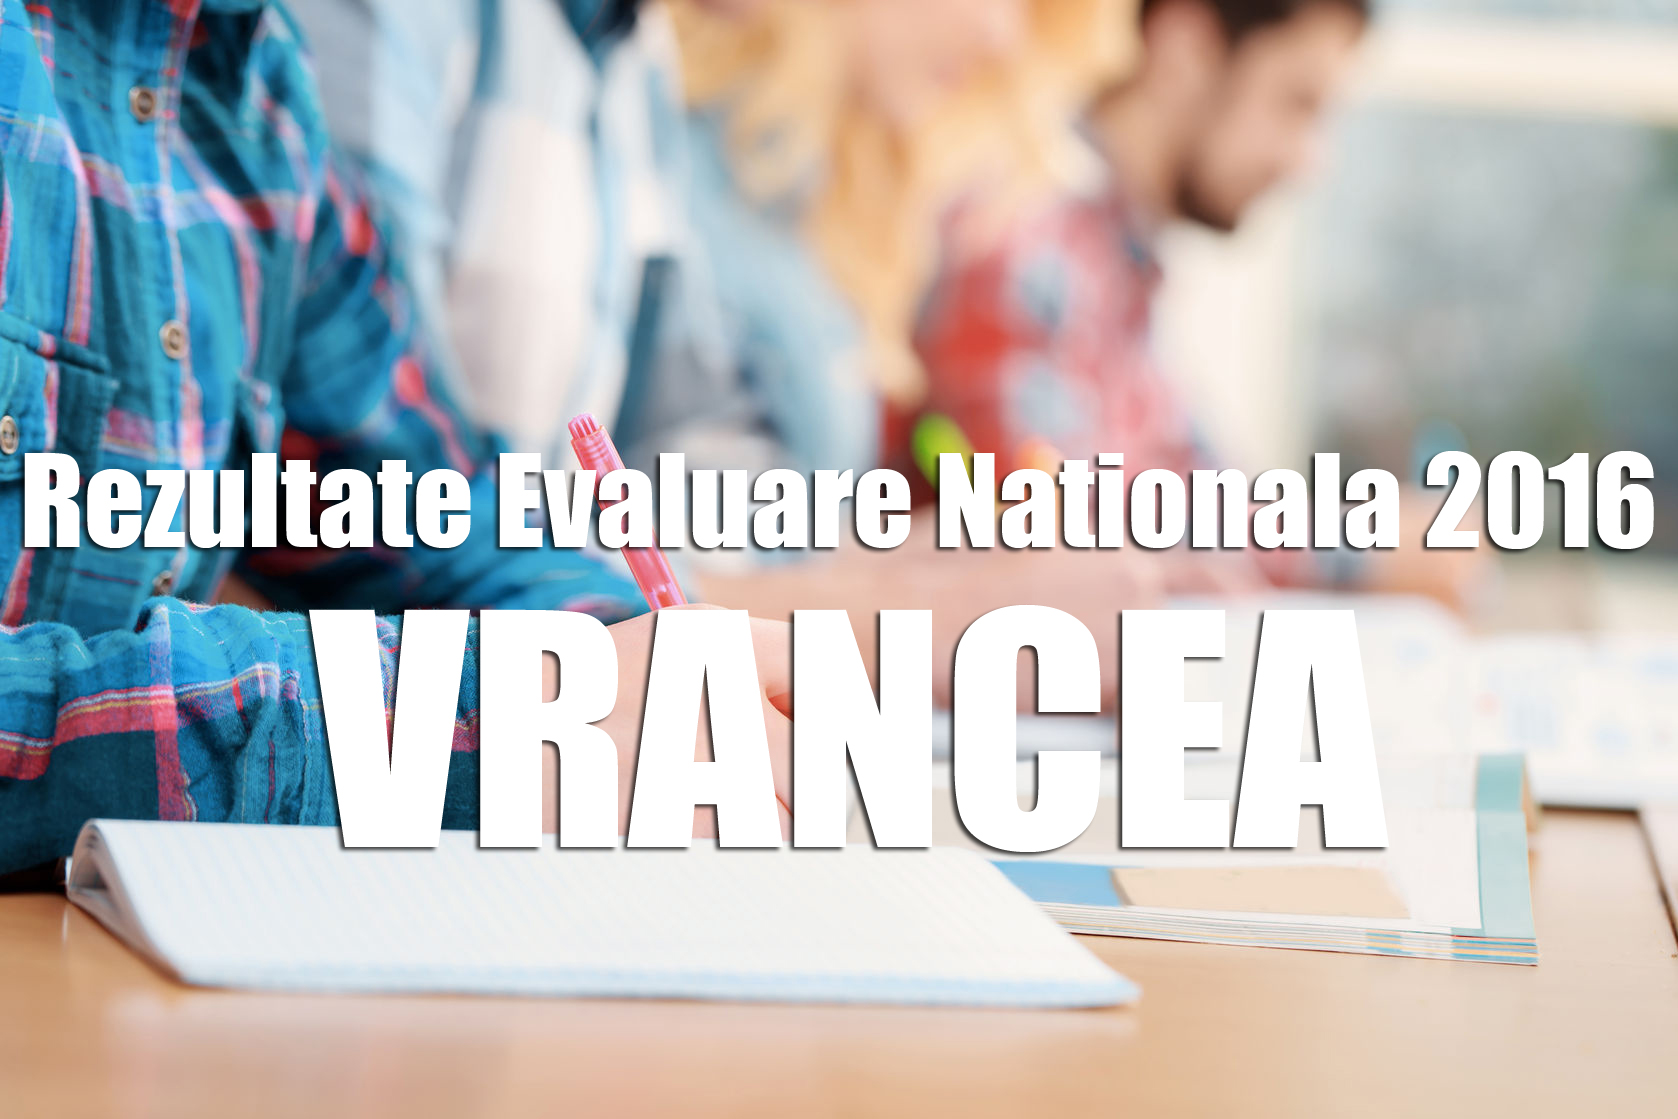 Rezultate-Evaluare-Nationala-2016-vrancea